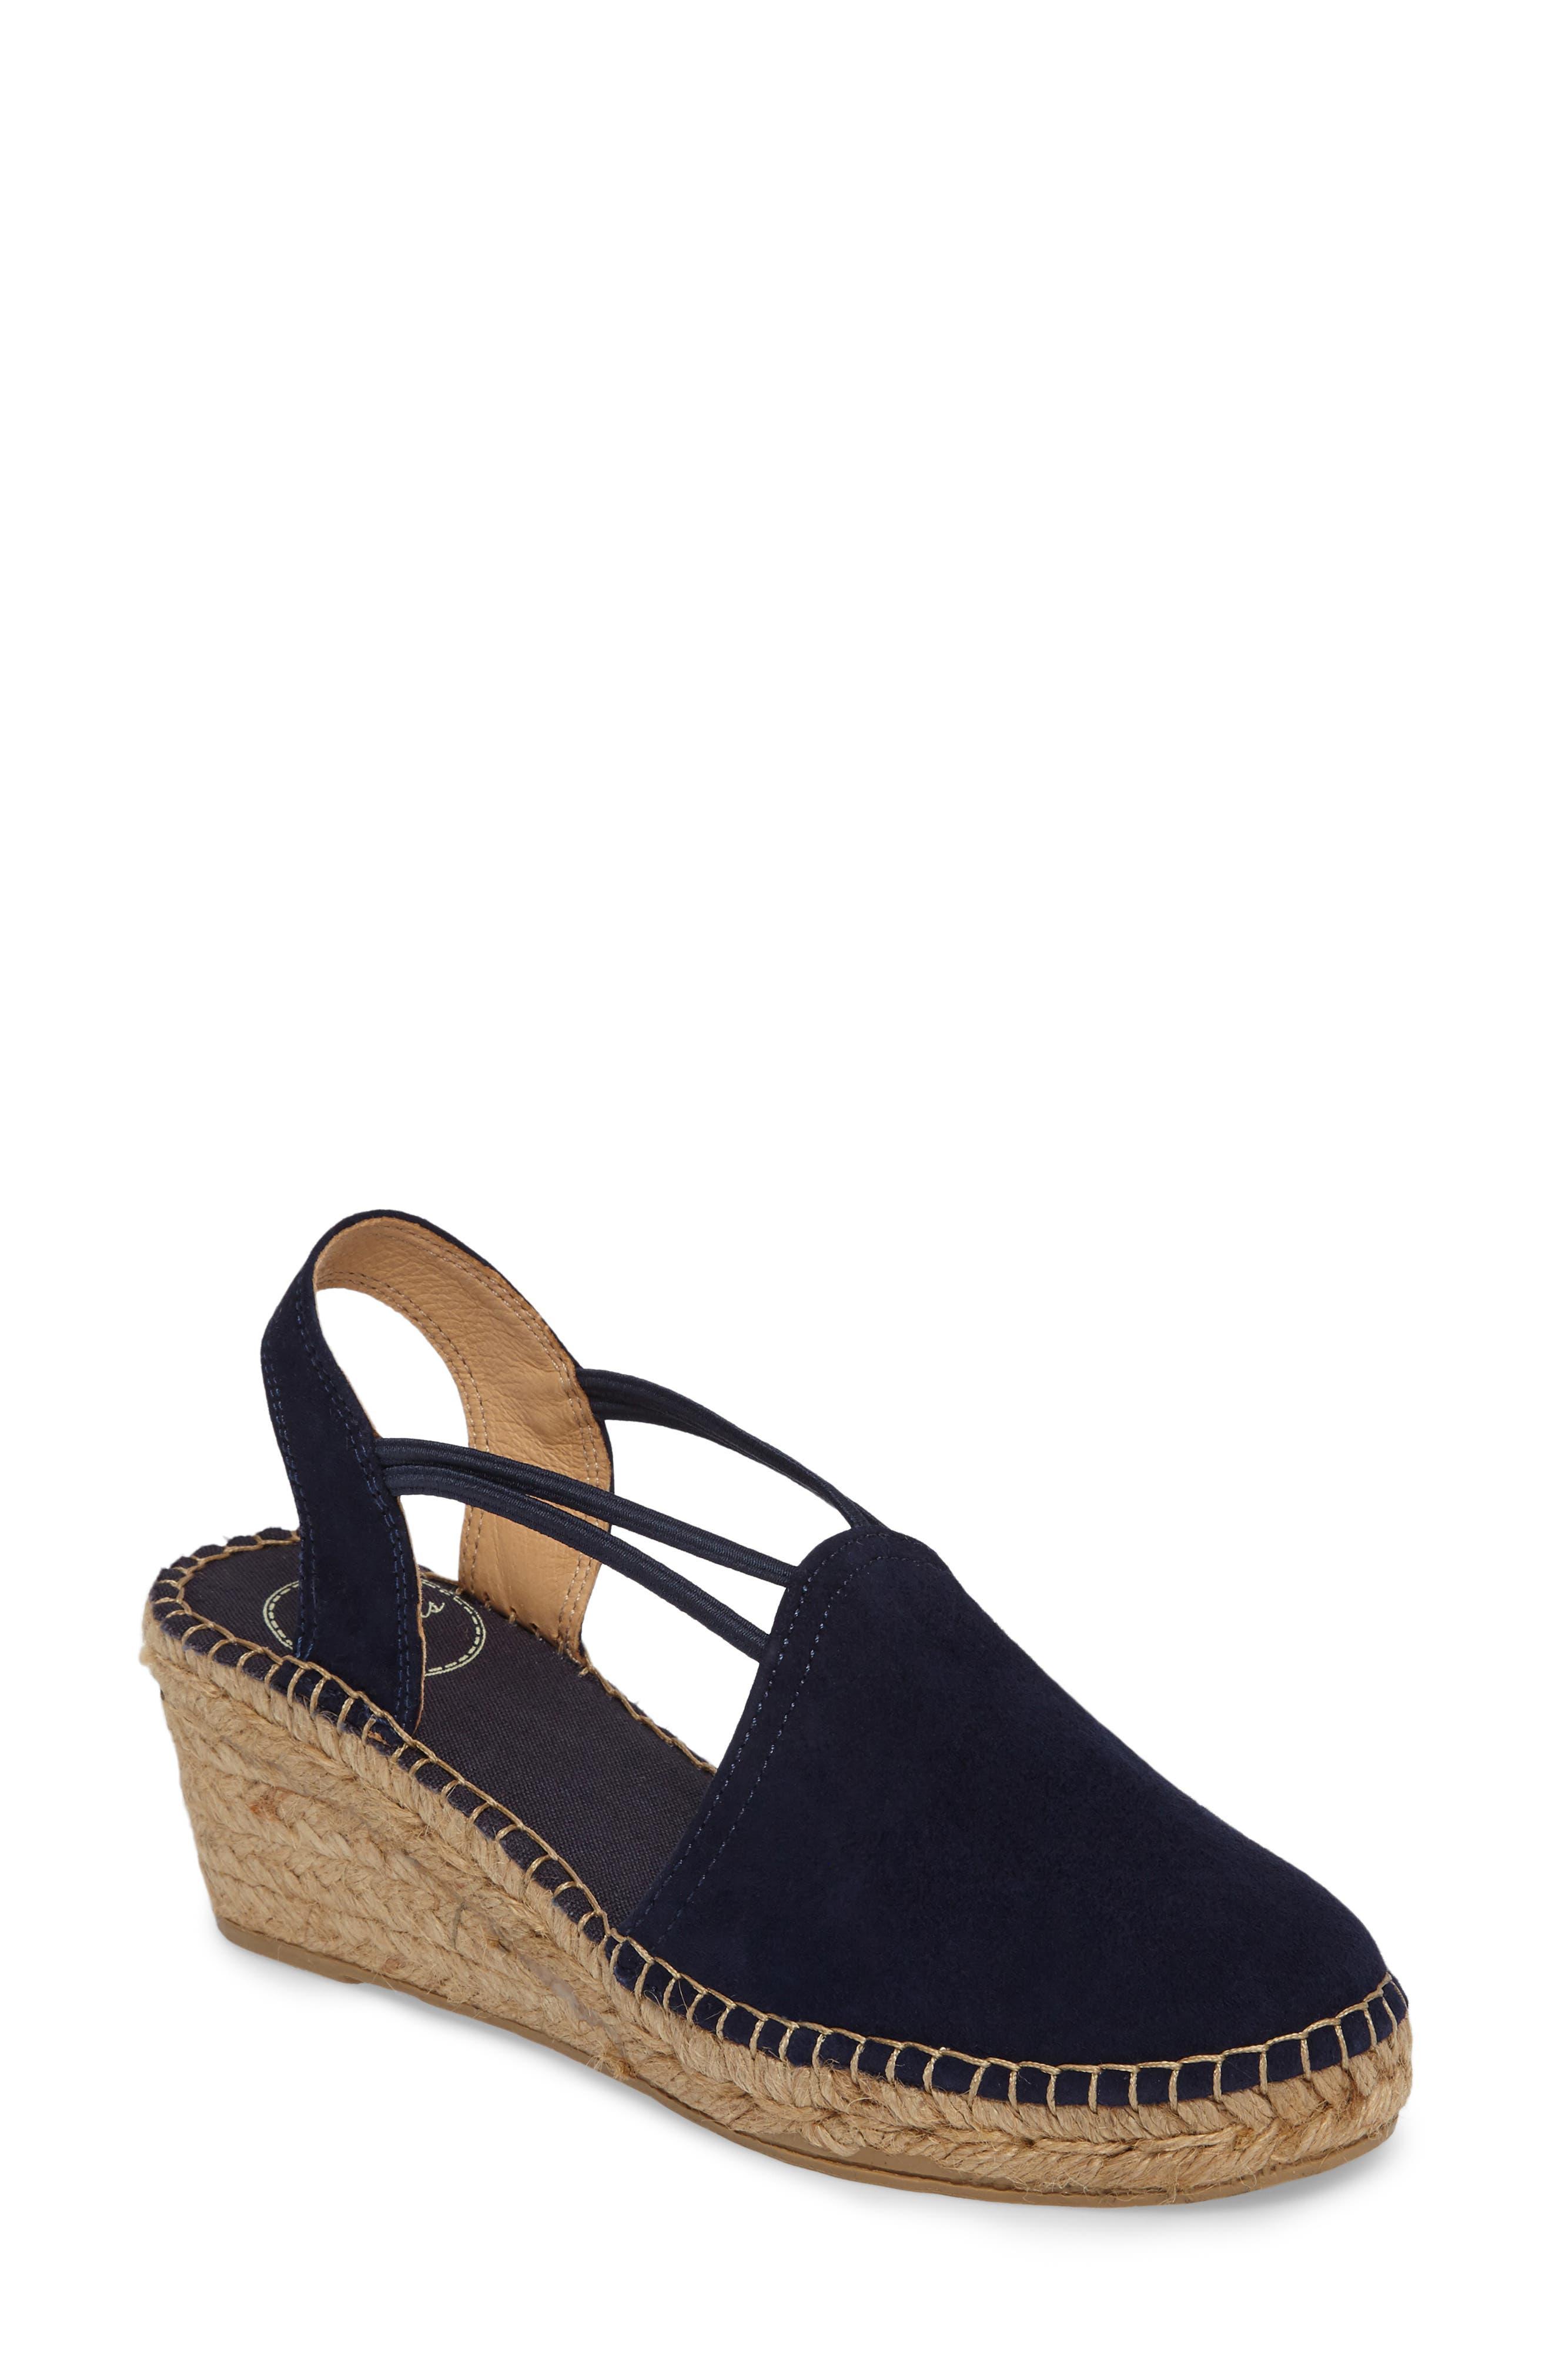 'Tremp' Slingback Espadrille Sandal, Main, color, NAVY SUEDE